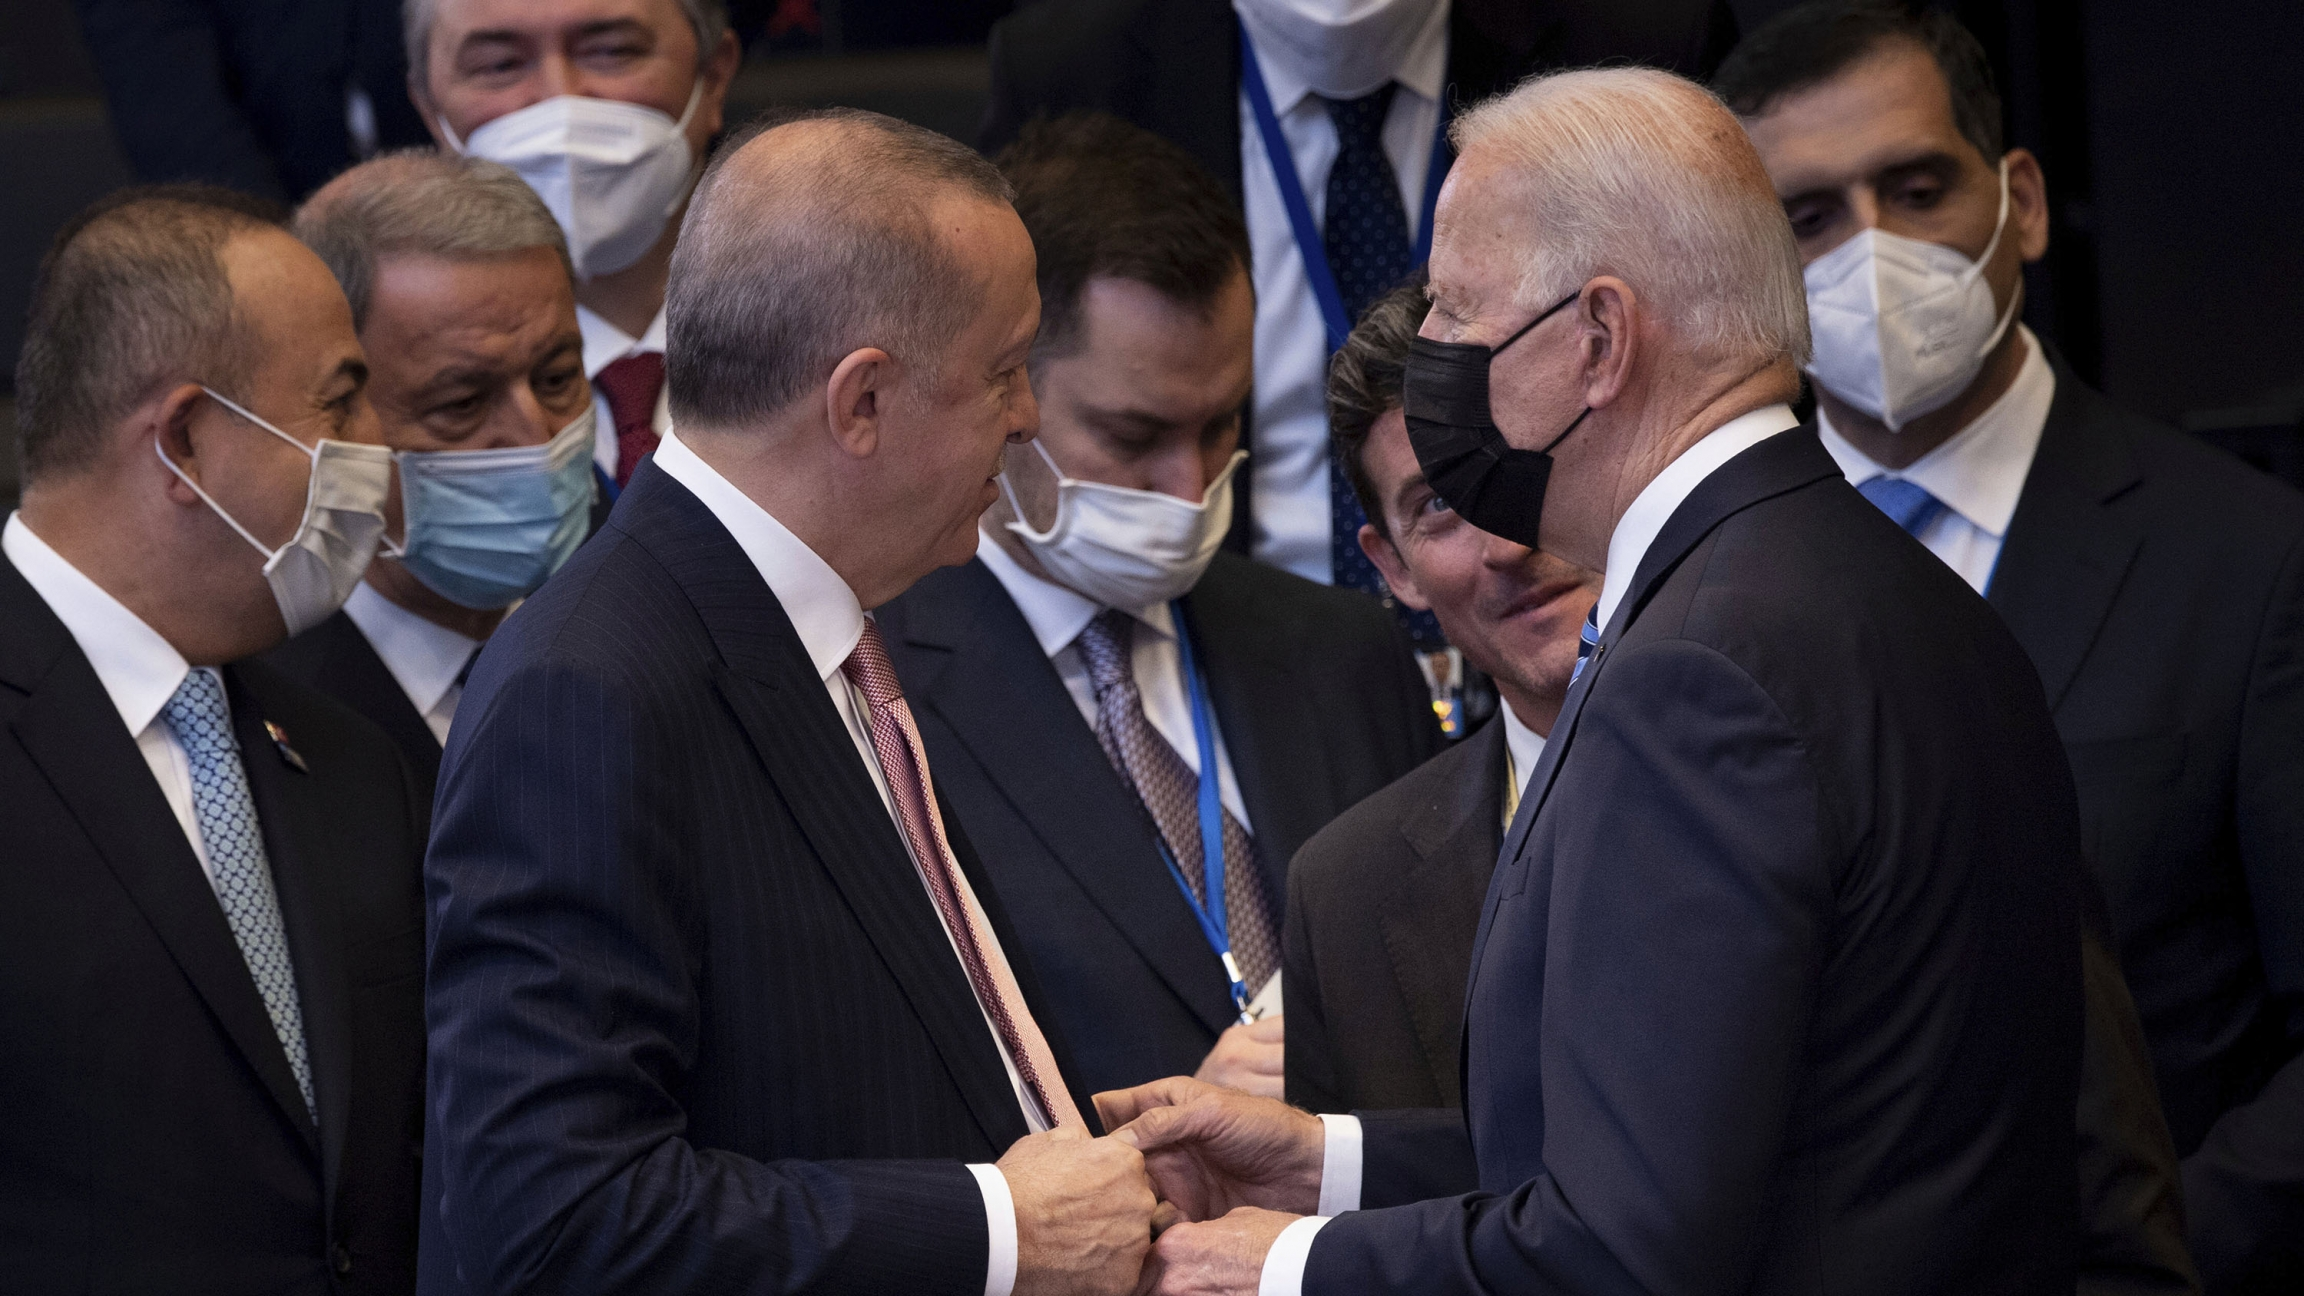 Turkey's President Recep Tayyip Erdoğan, center left, greets US President Joe Biden, center right, during a plenary session during a NATO summit at NATO headquarters in Brussels, Monday, June 14, 2021.